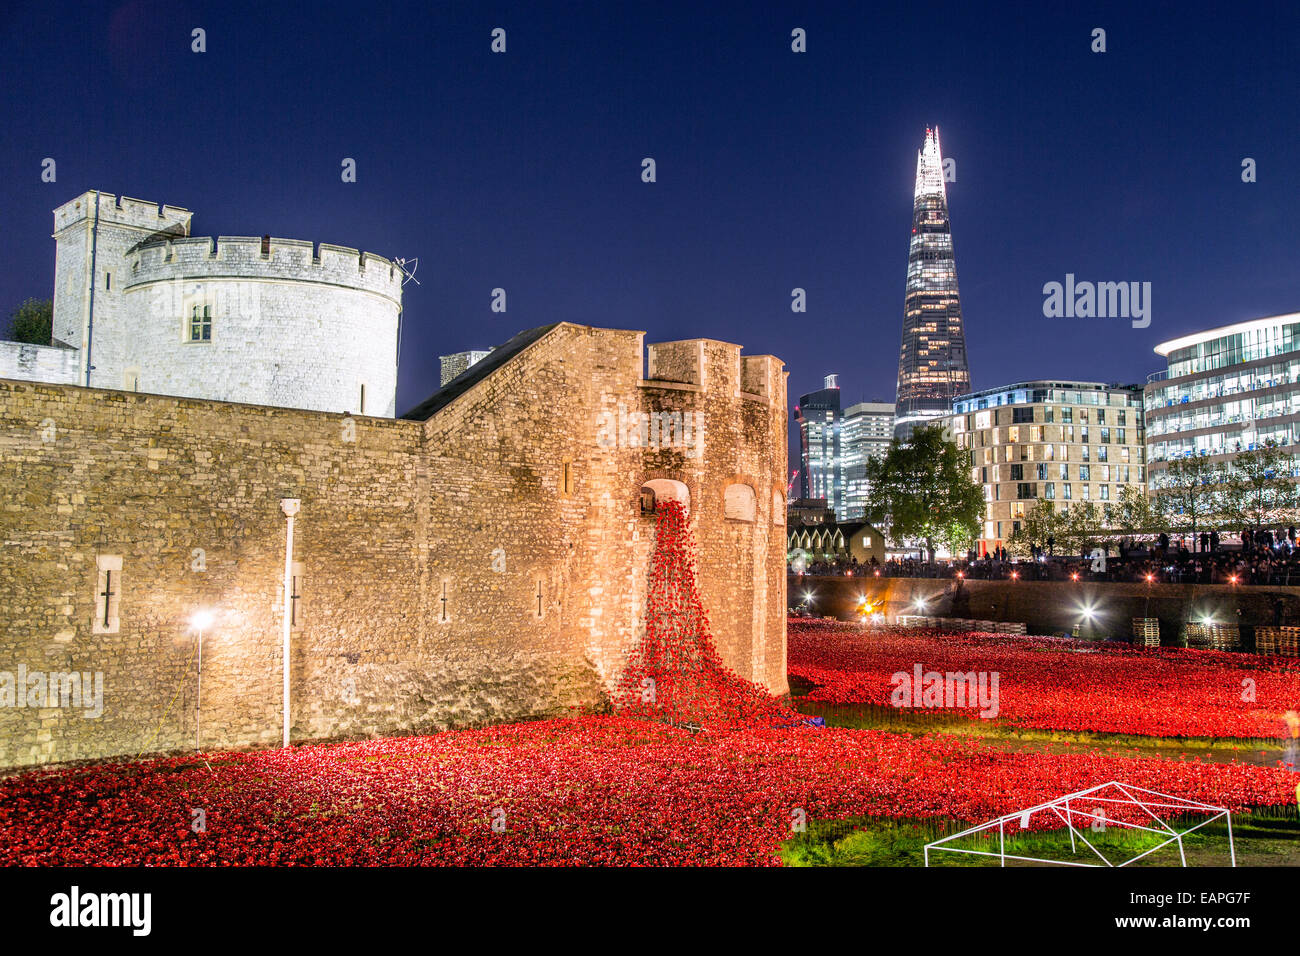 The Ceramic Poppy Memorial at Night Tower Of London UK Stock Photo